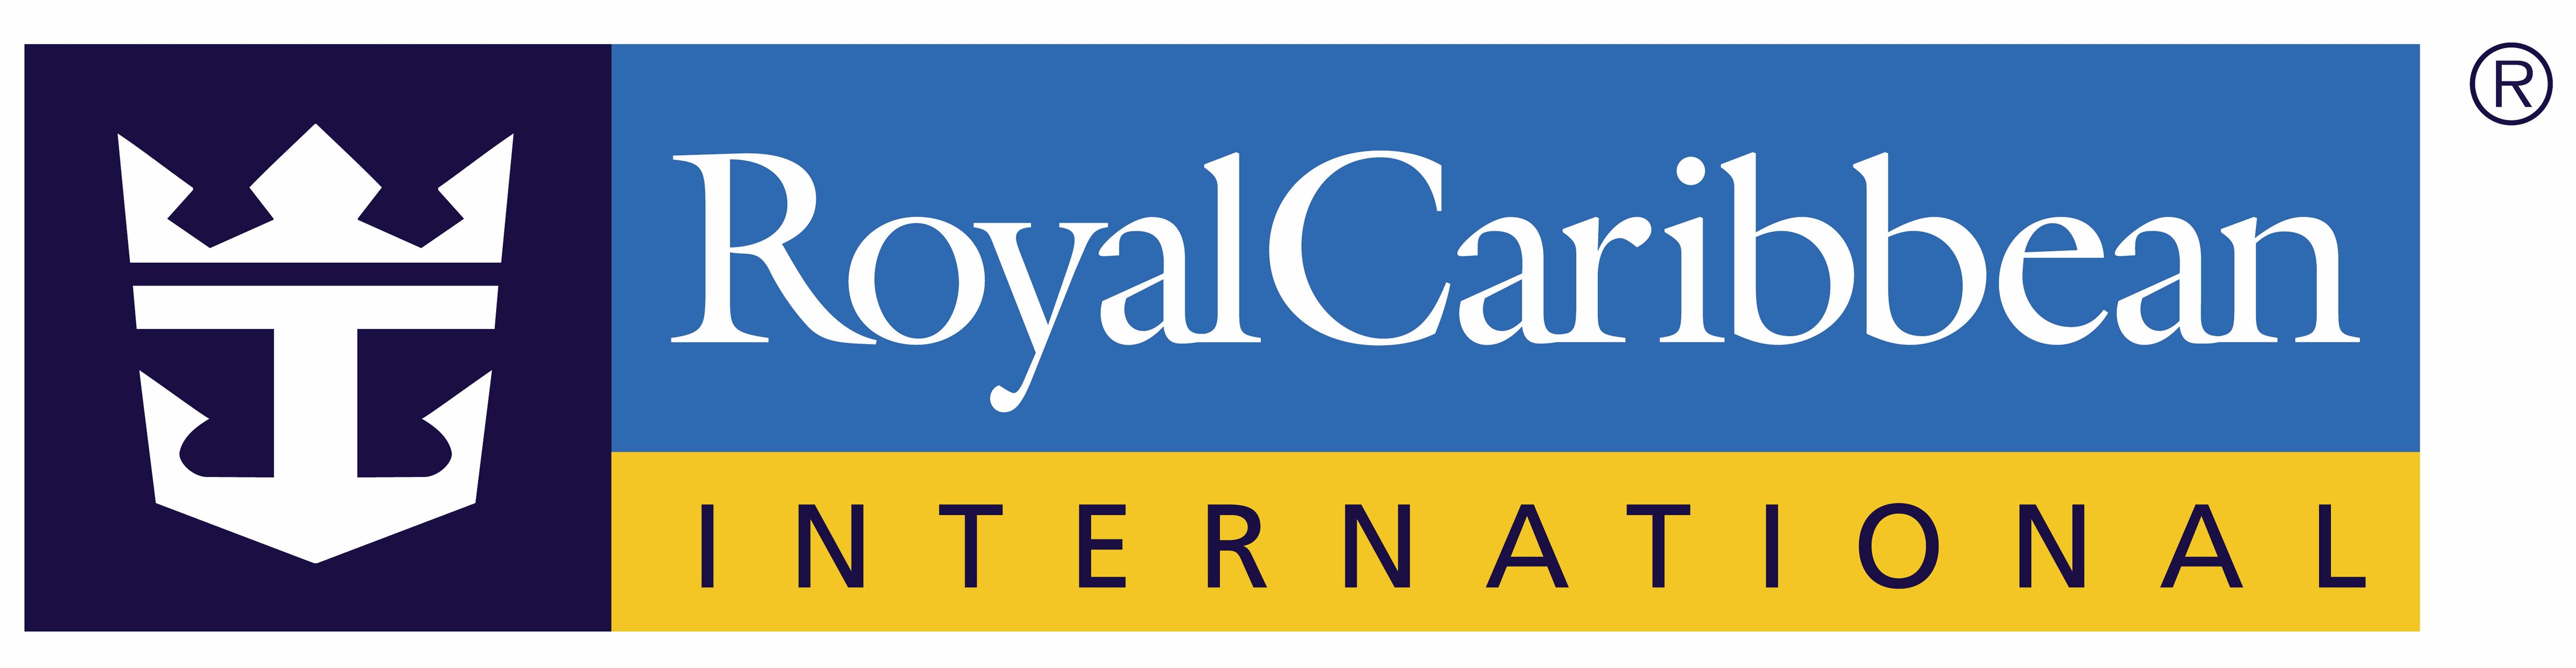 royal caribbean credit card payment - login